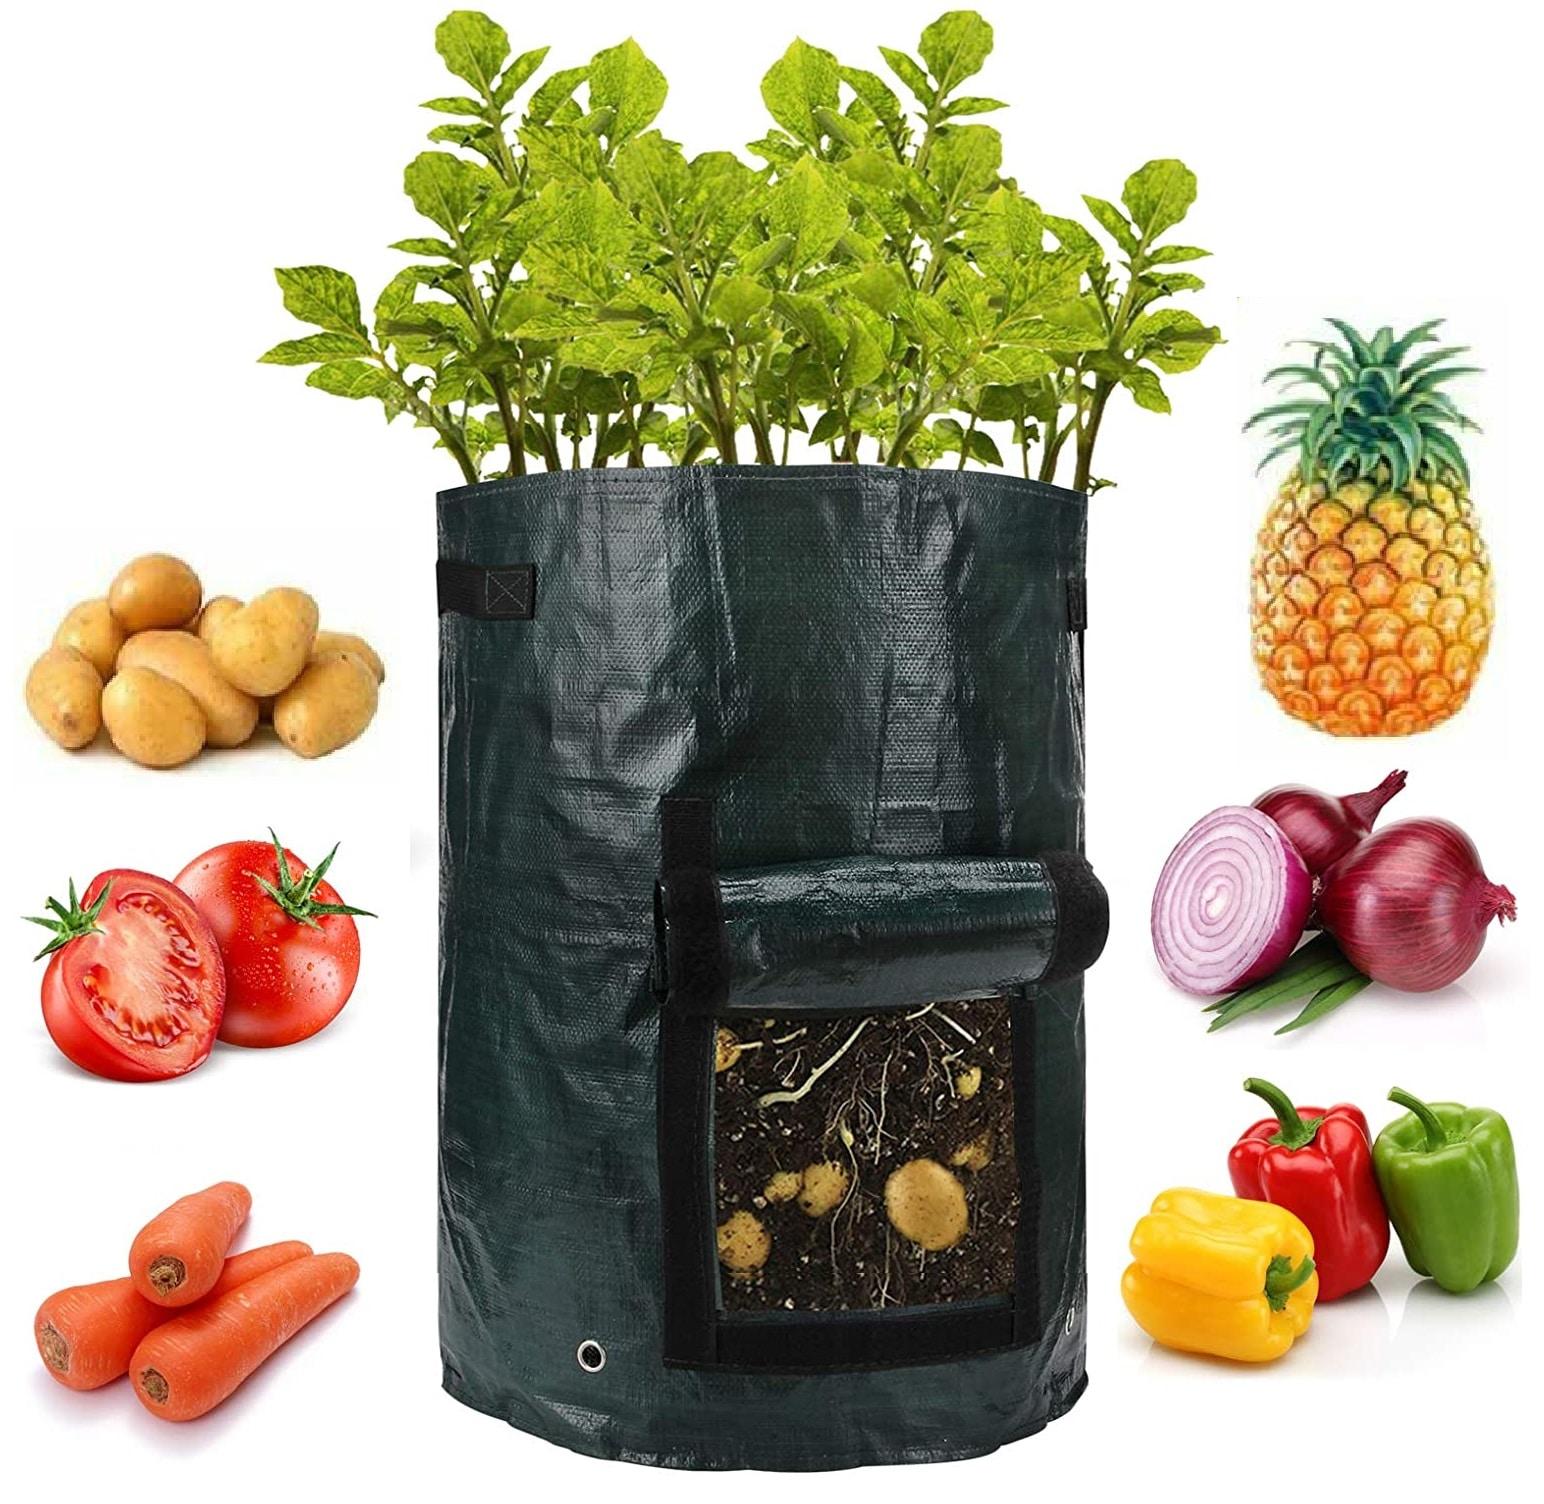 ANPHSIN Grow Bags – Best 10 Gallon Grow Bags